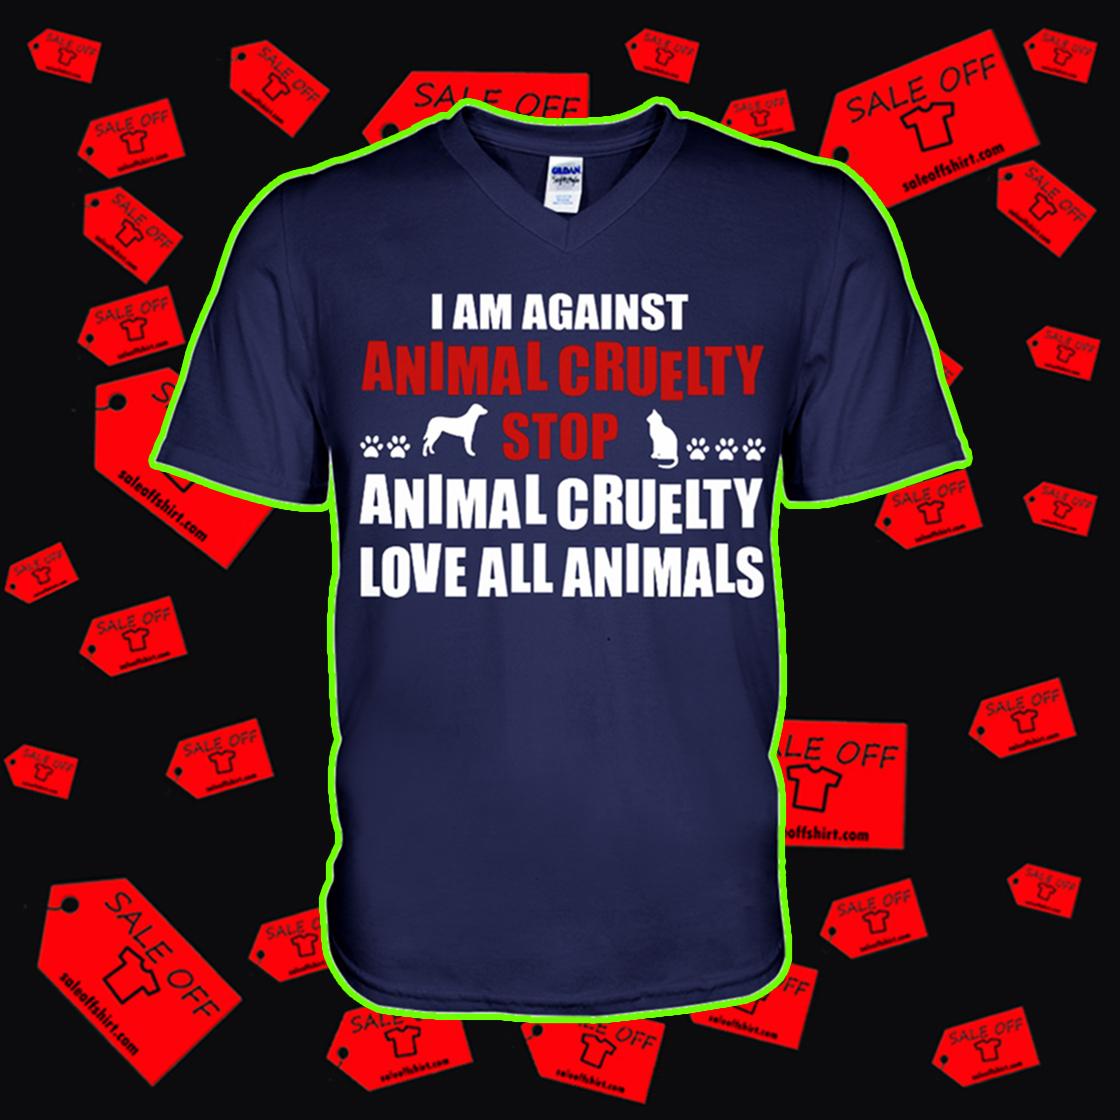 I am against animal cruelty stop animal cruelty love all animals v-neck